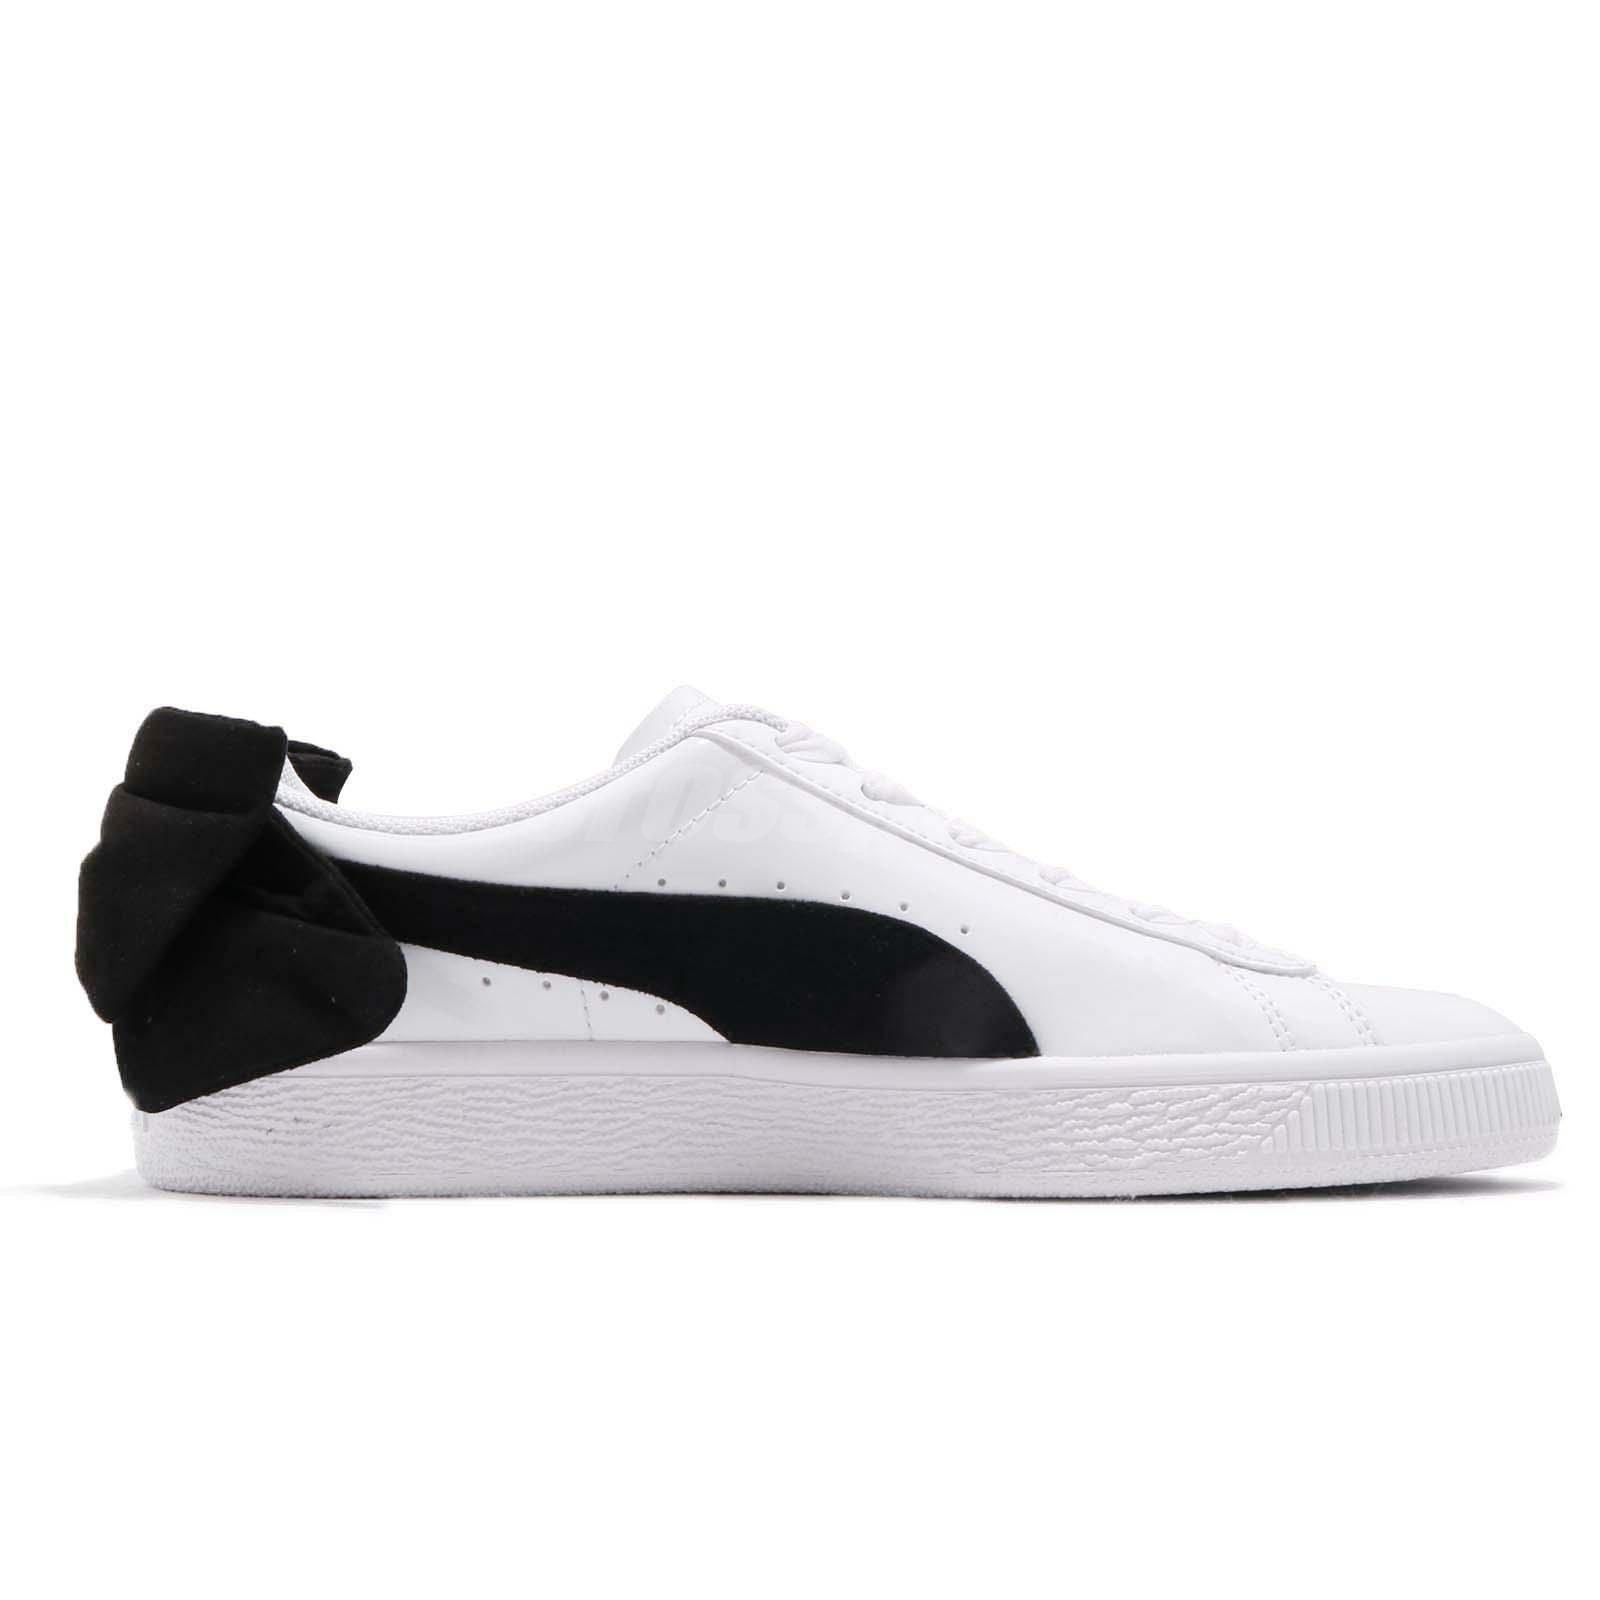 a5ce60322a44 Puma Basket Bow SB Wns White Black Women Casual Fashion Shoes ...